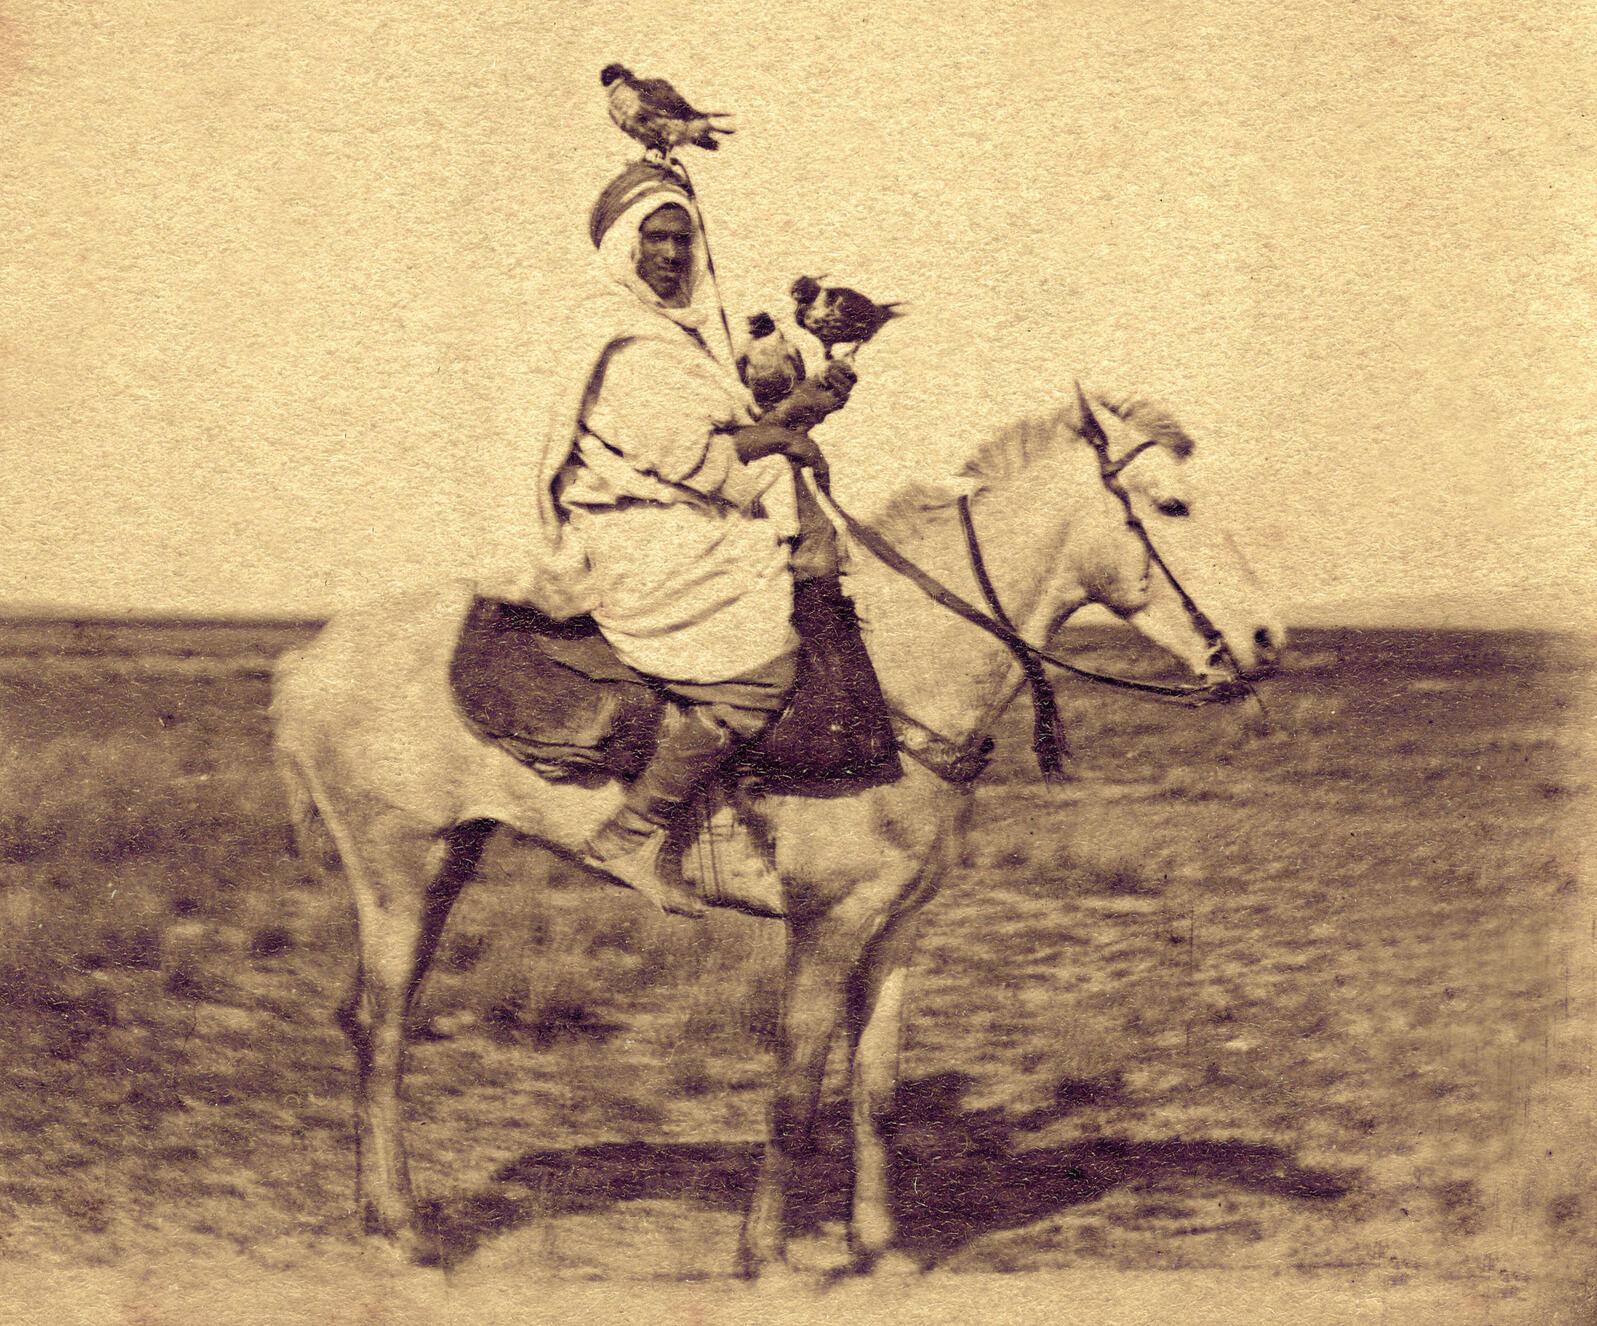 An Arab falconer accompanied by his trained hunters, circa 1890. Adoc-photos/Art Resource, NY